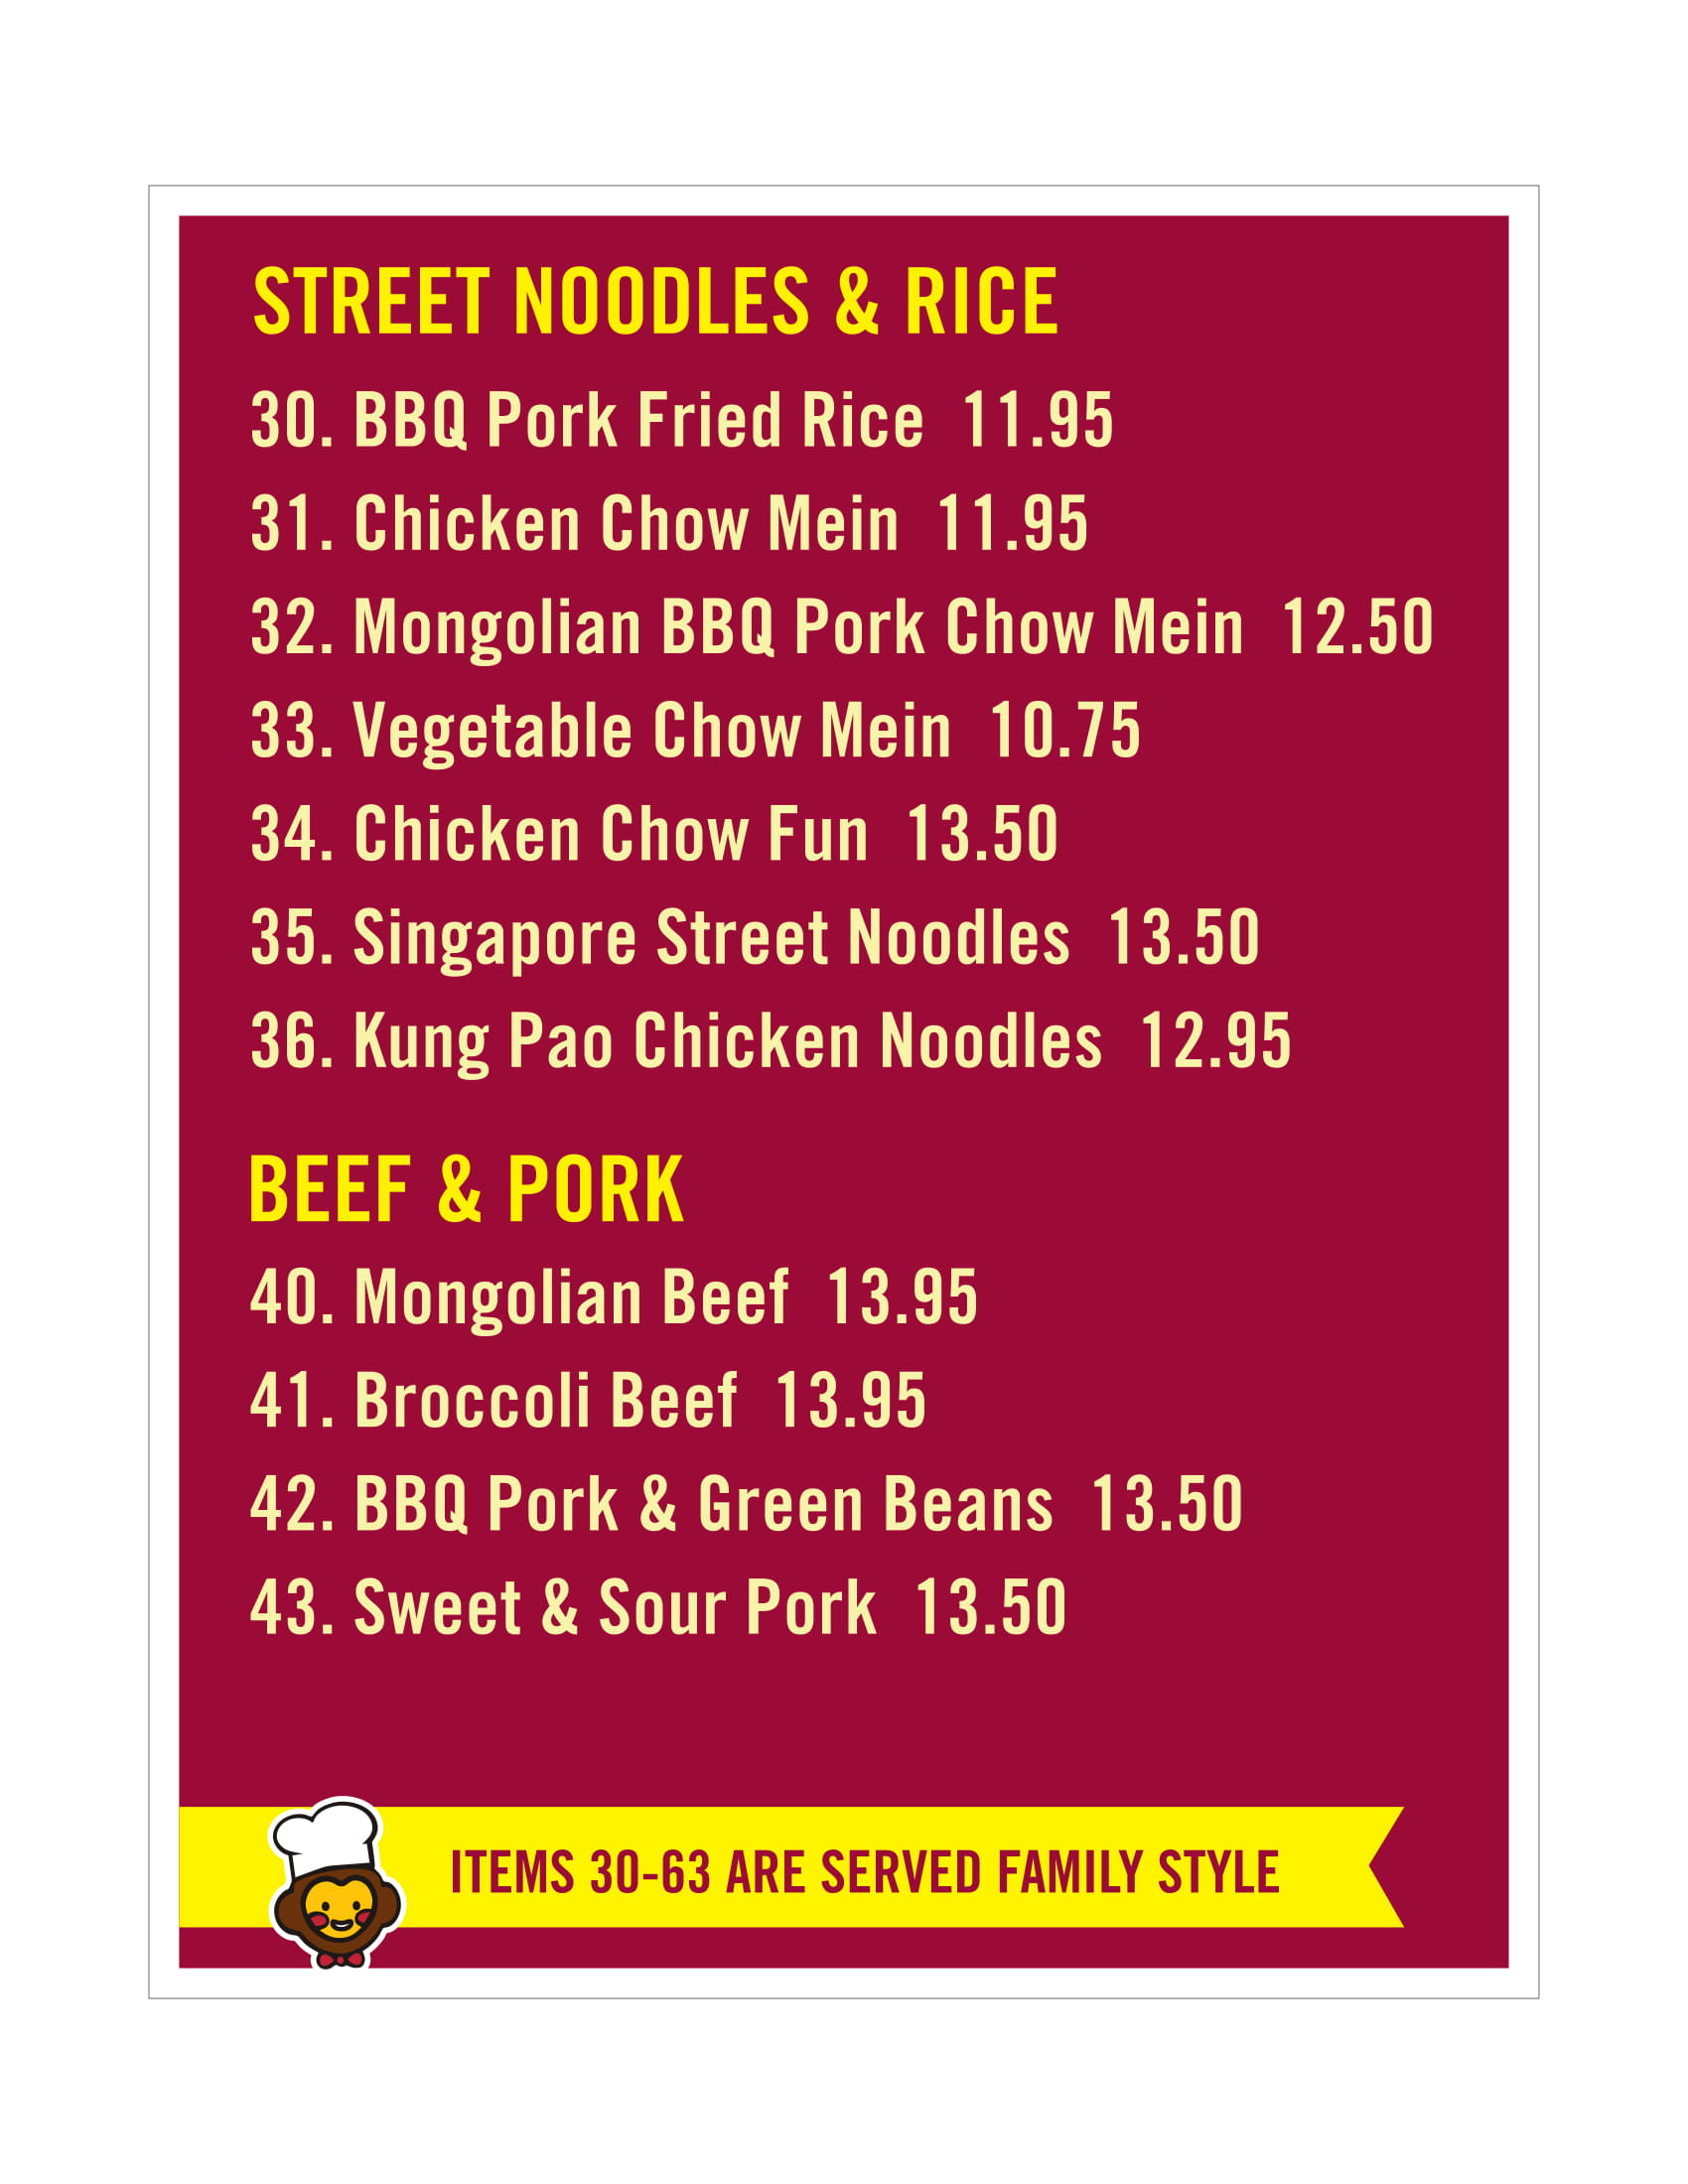 Street noodle-1.jpg